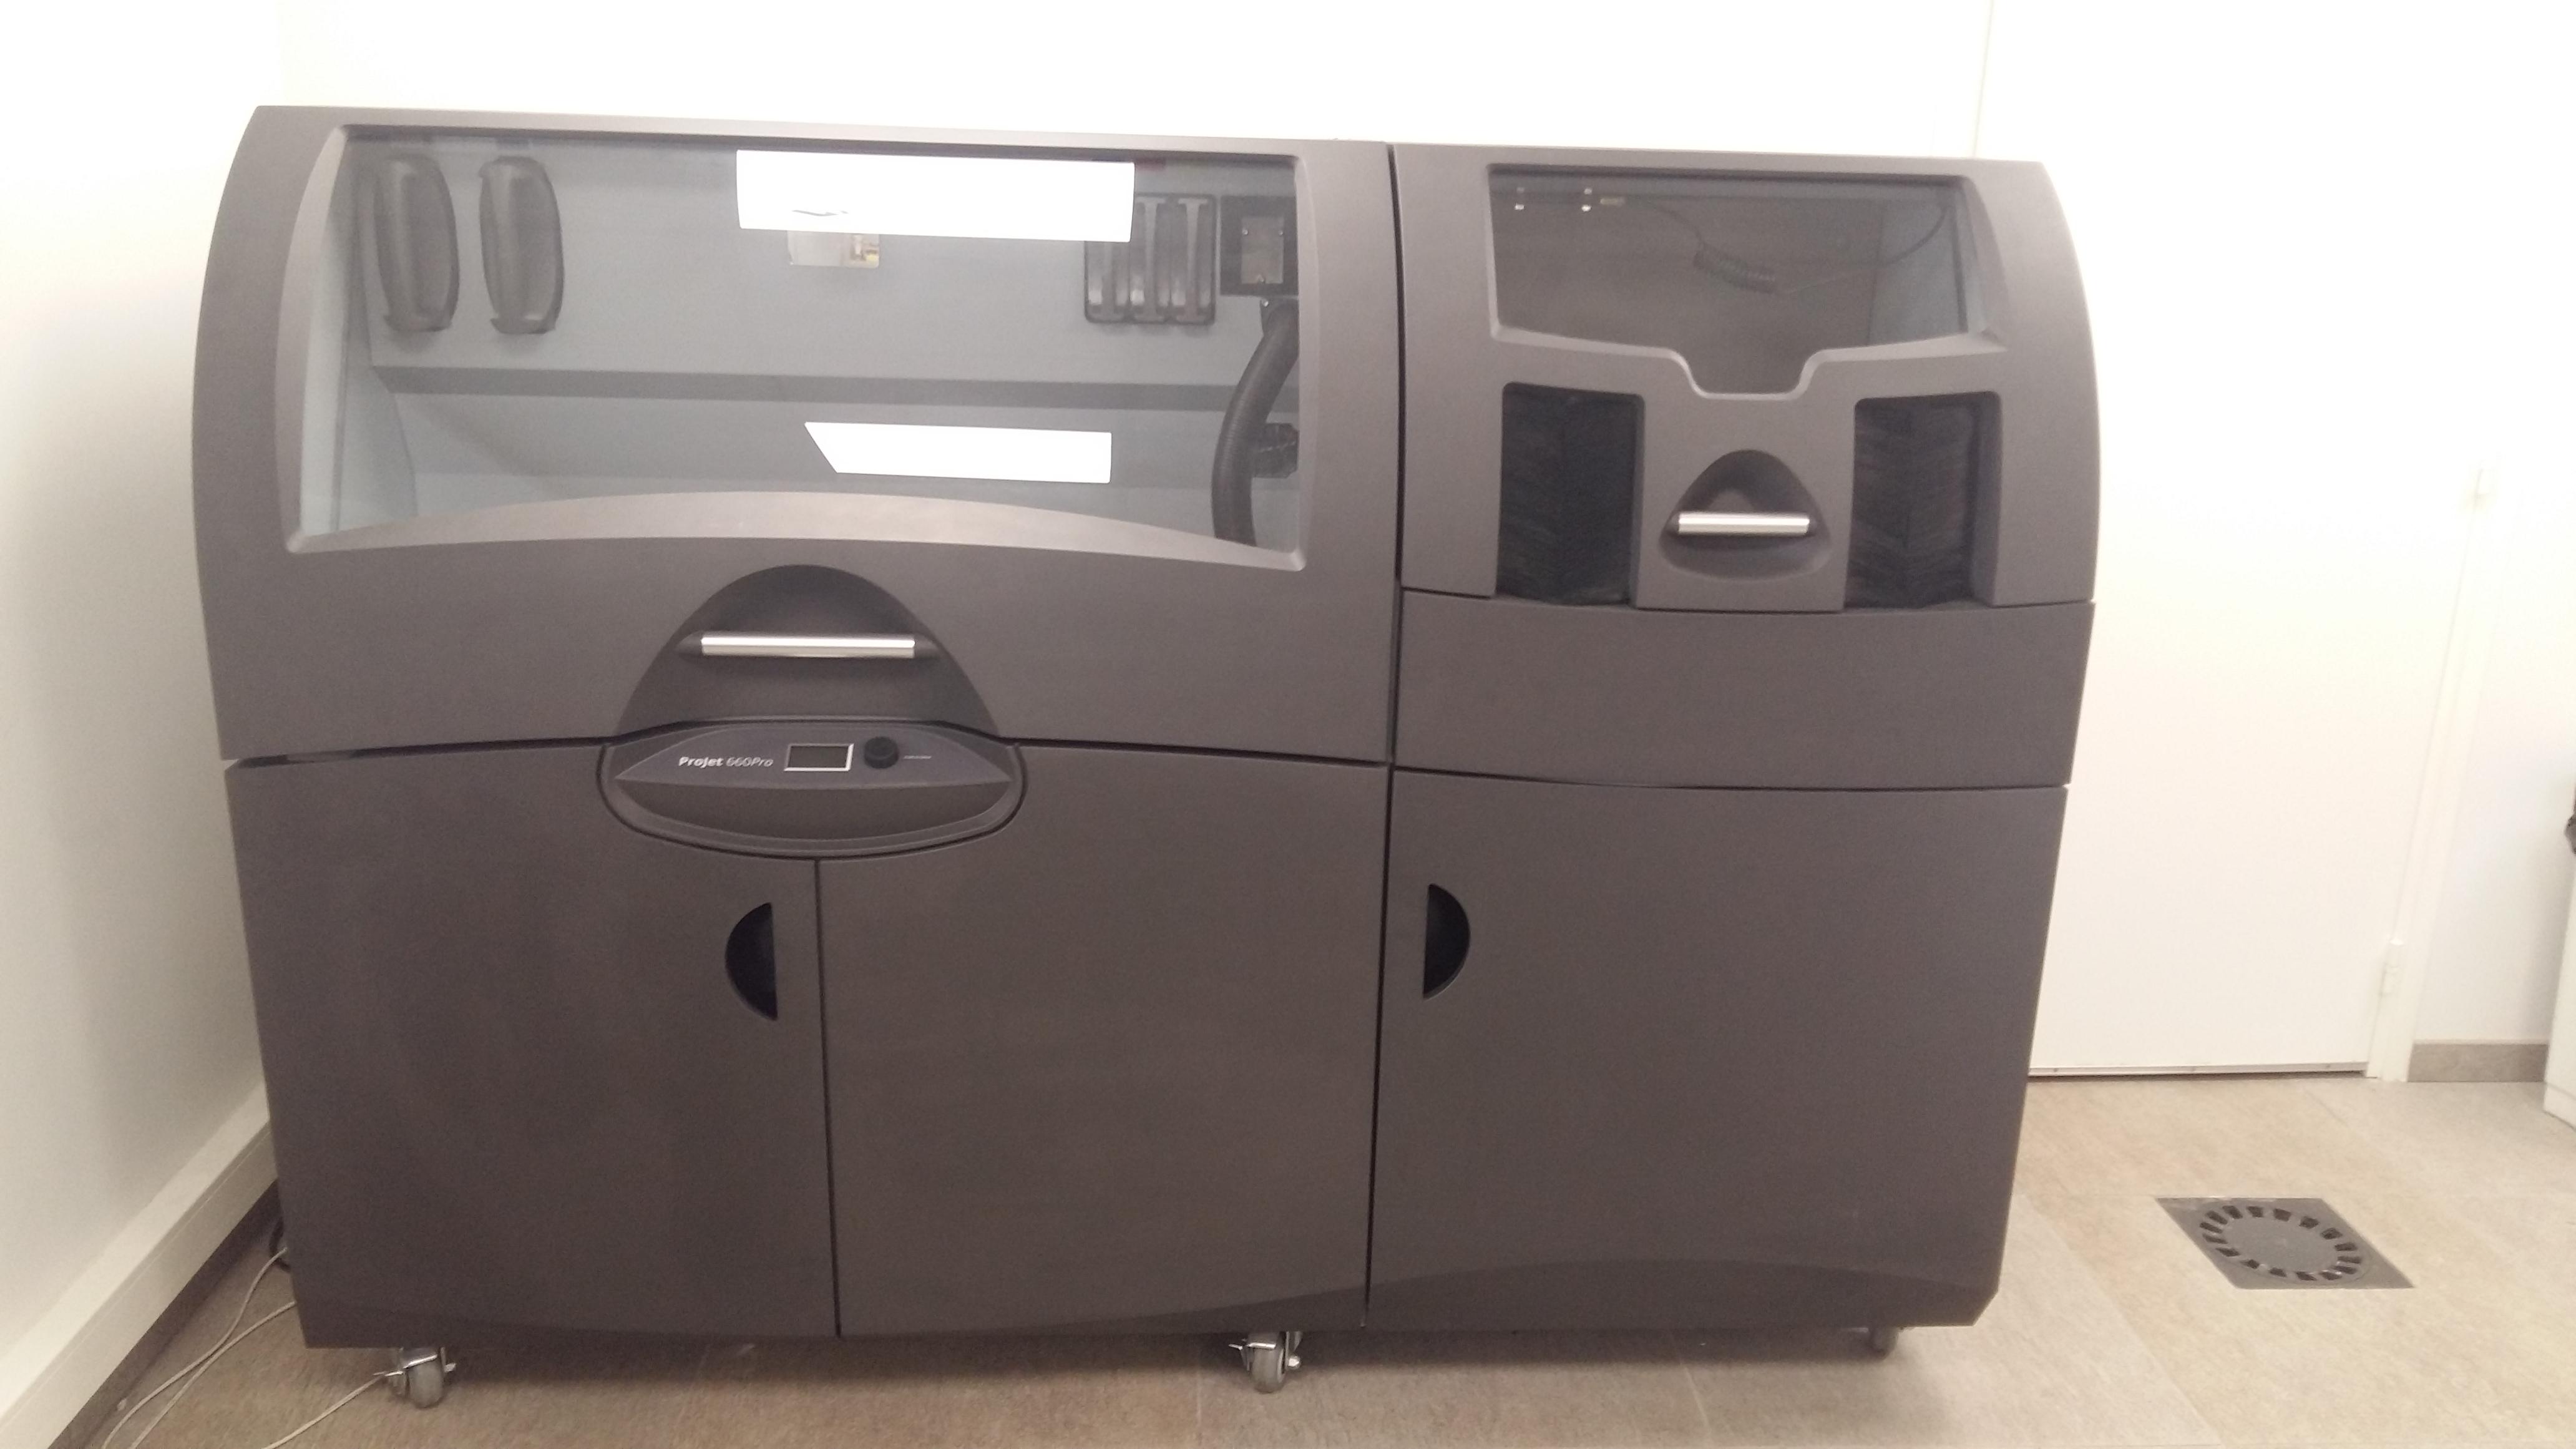 Projet 660 PRO 3D Printer - Exapro